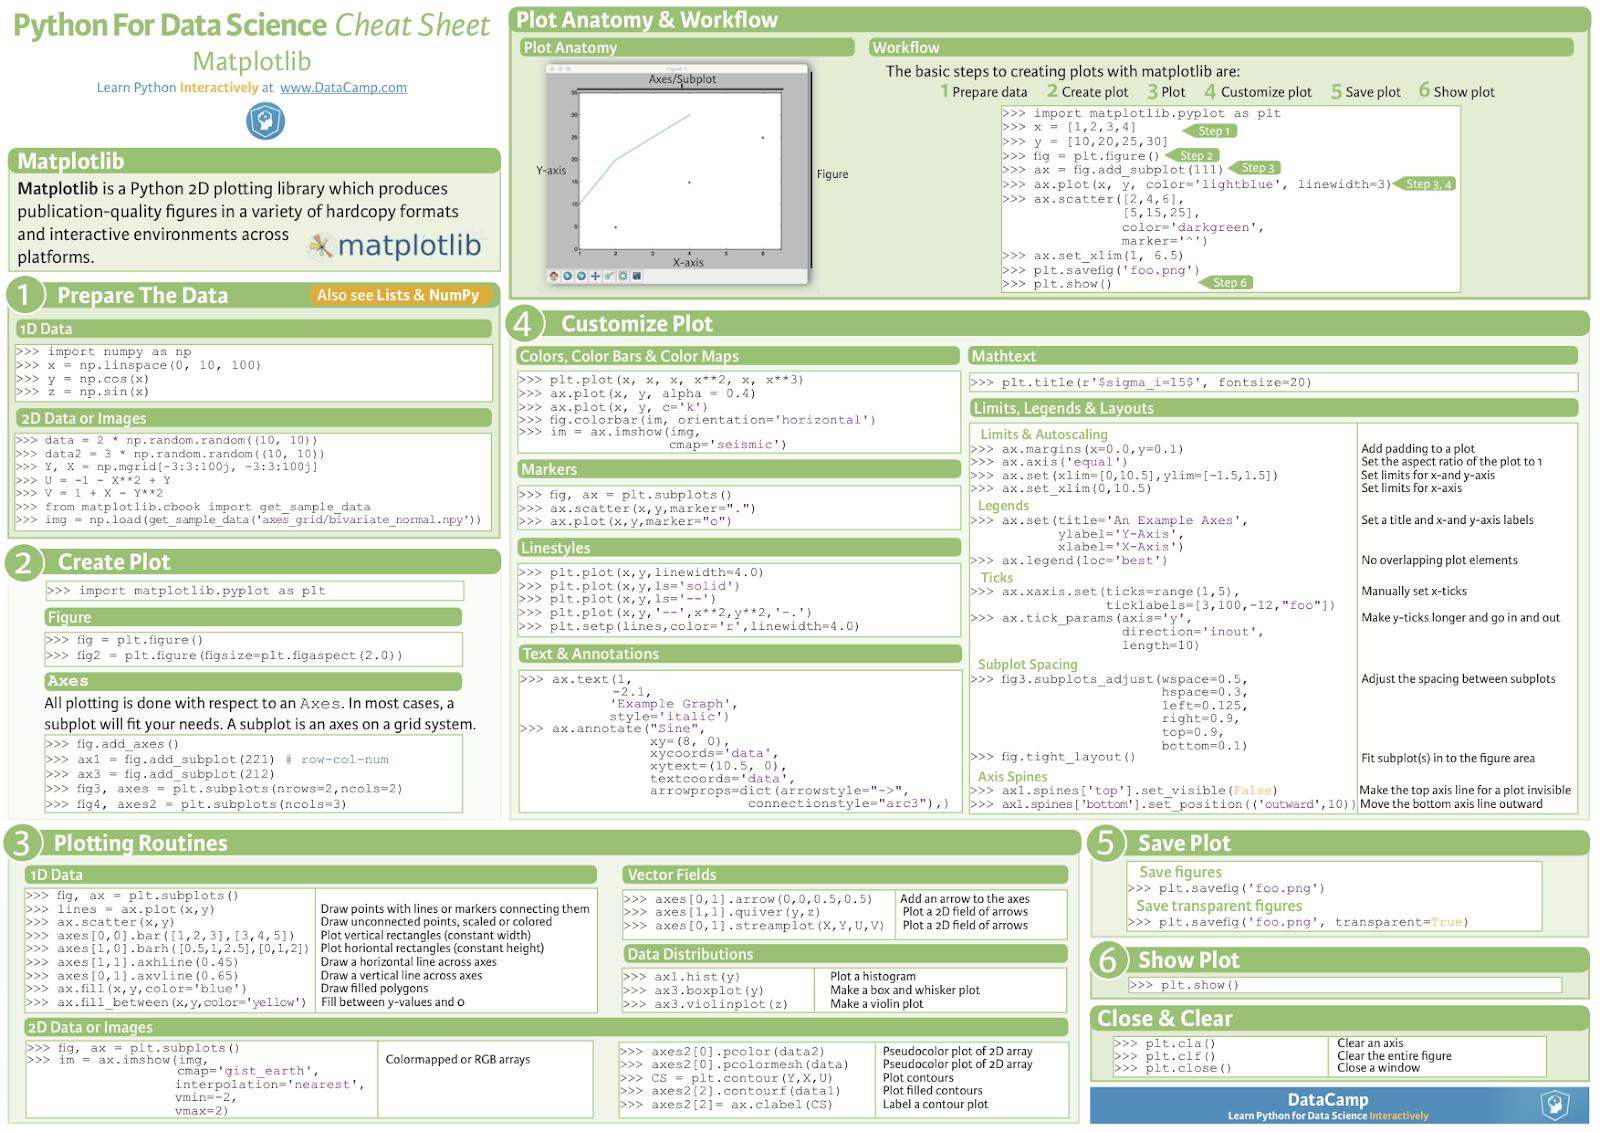 Python Basic, Cheat Sheets & ETL | VelocityOn Learning - Excel/BI